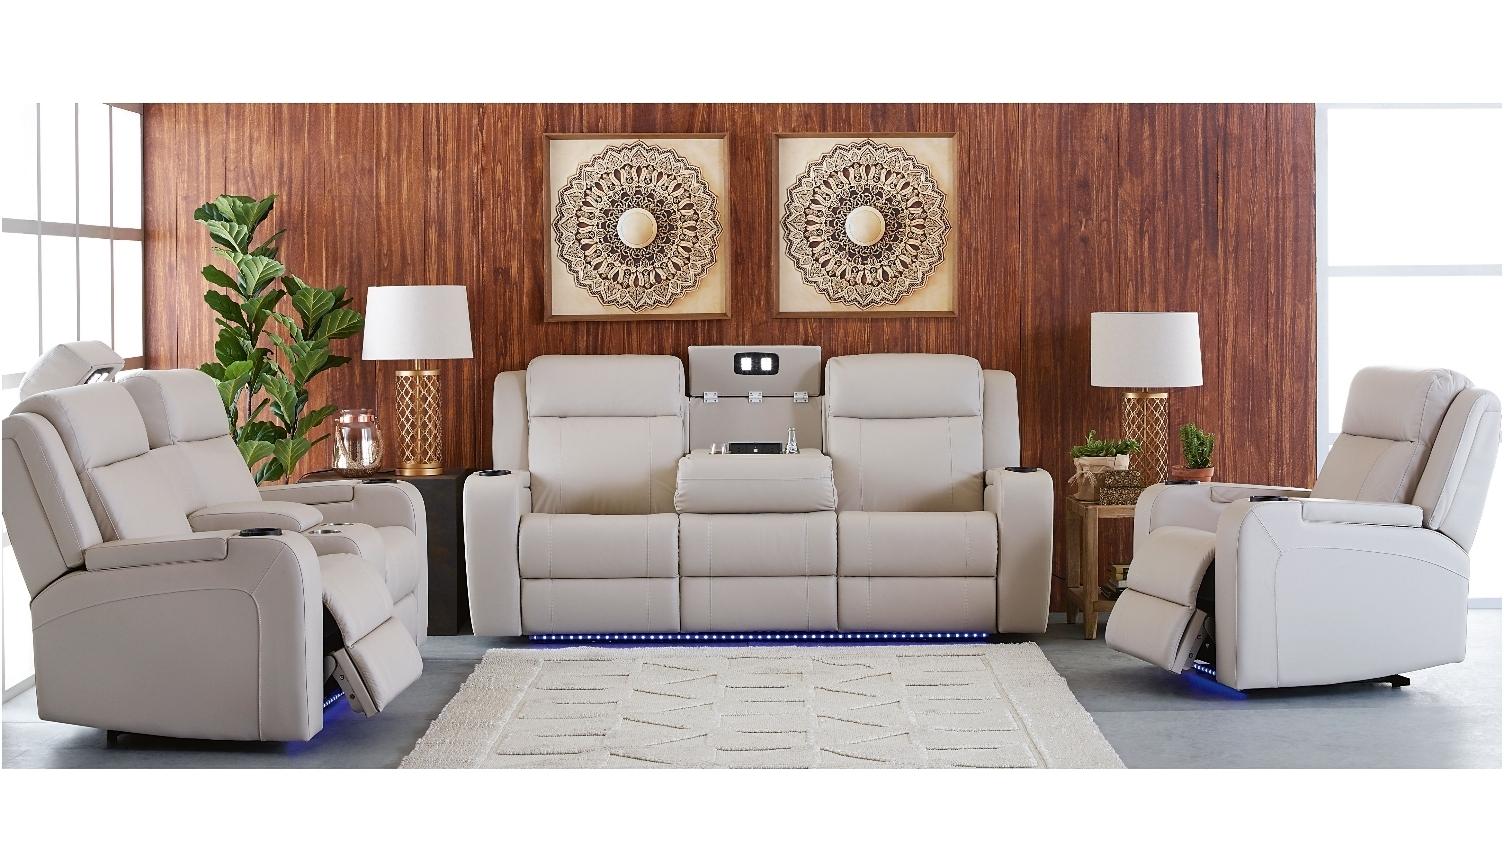 Buy Marina 3 Seater Powered Recliner Leather Sofa | Harvey Norman AU